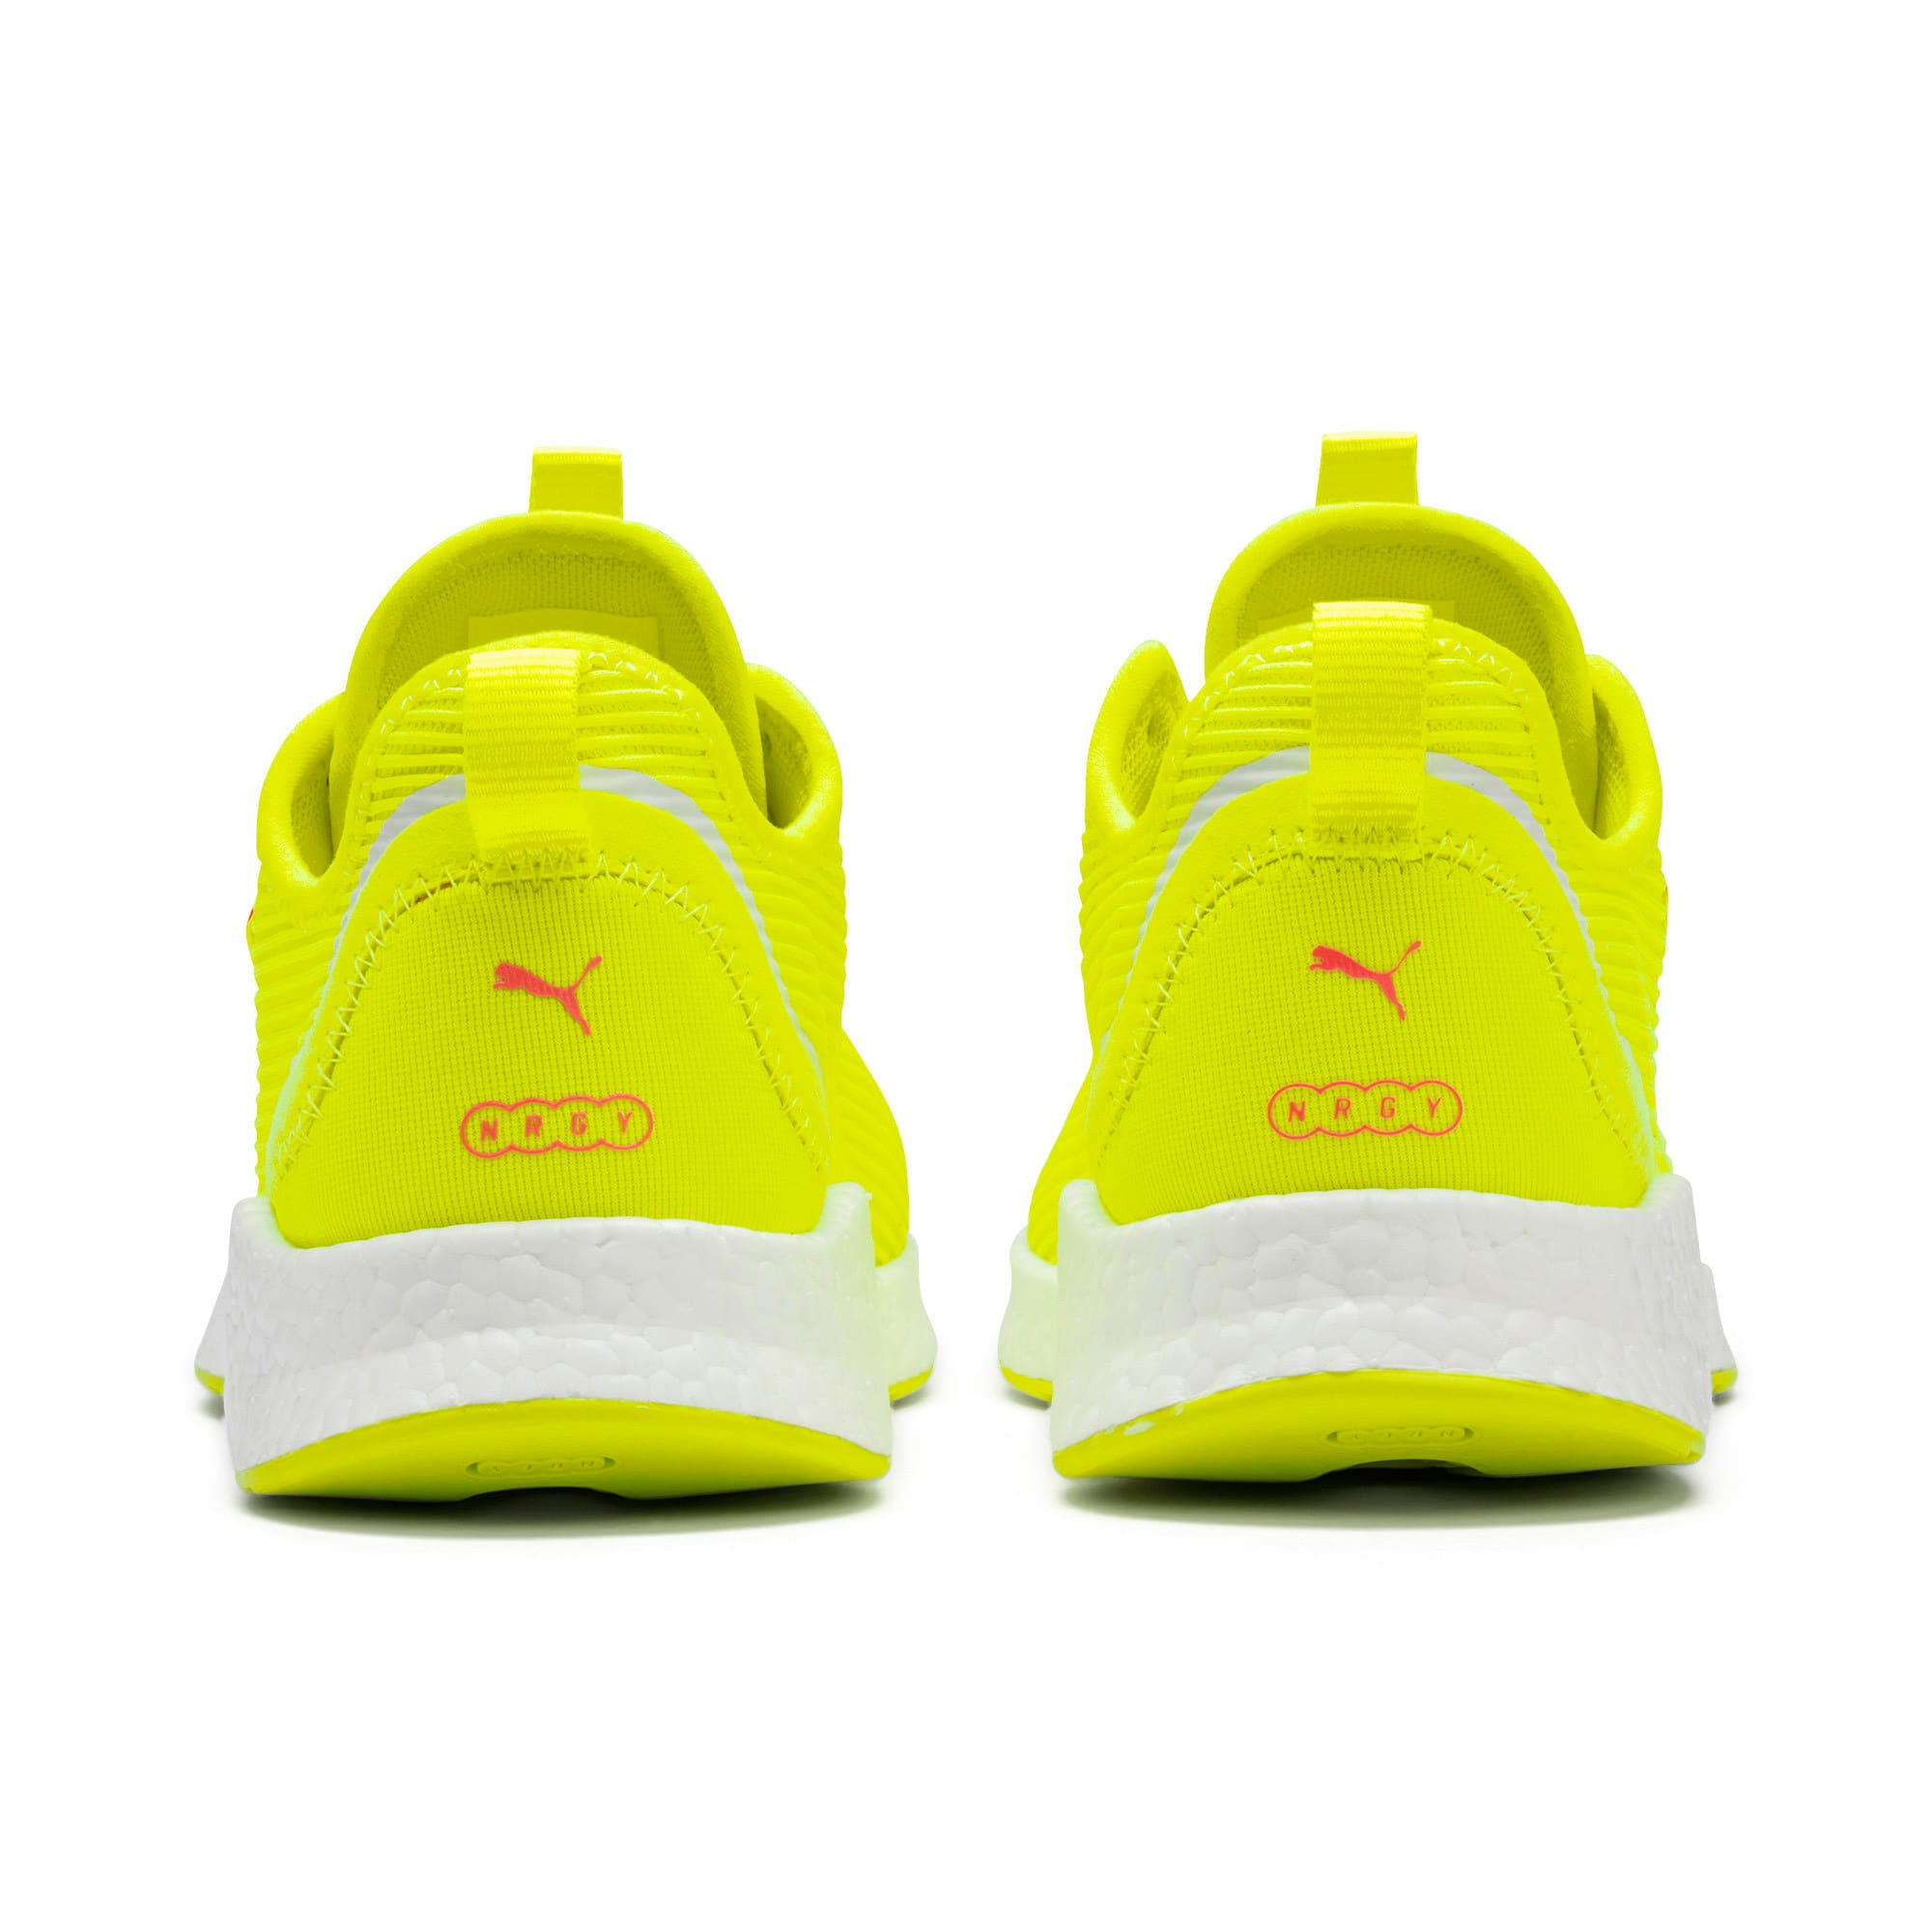 Miniatura 5 de Zapatos para correr NRGY Star Femme para mujer, Yellow Alert-Pink Alert, mediano